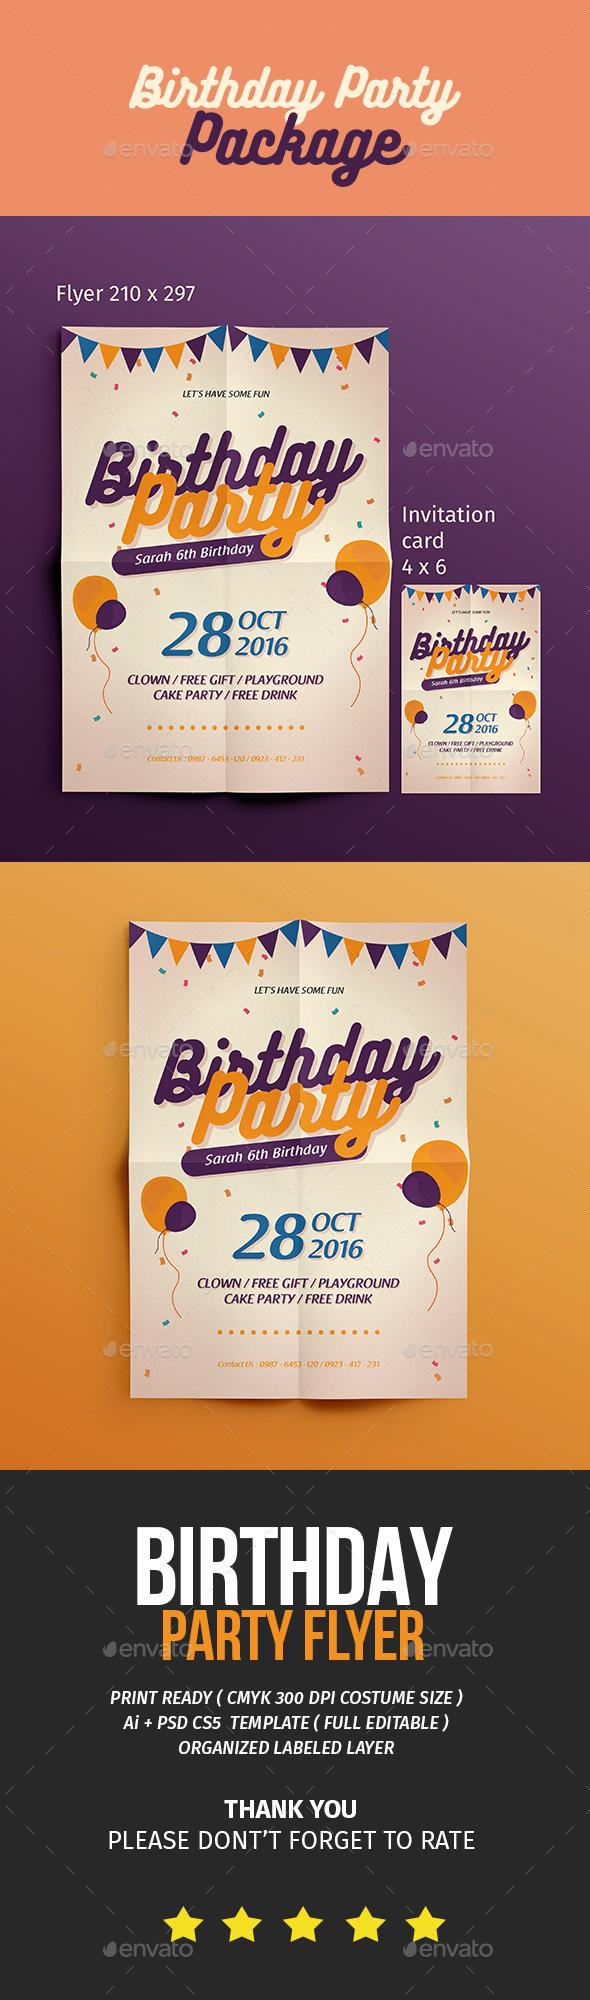 birthday flyer invitation events flyers